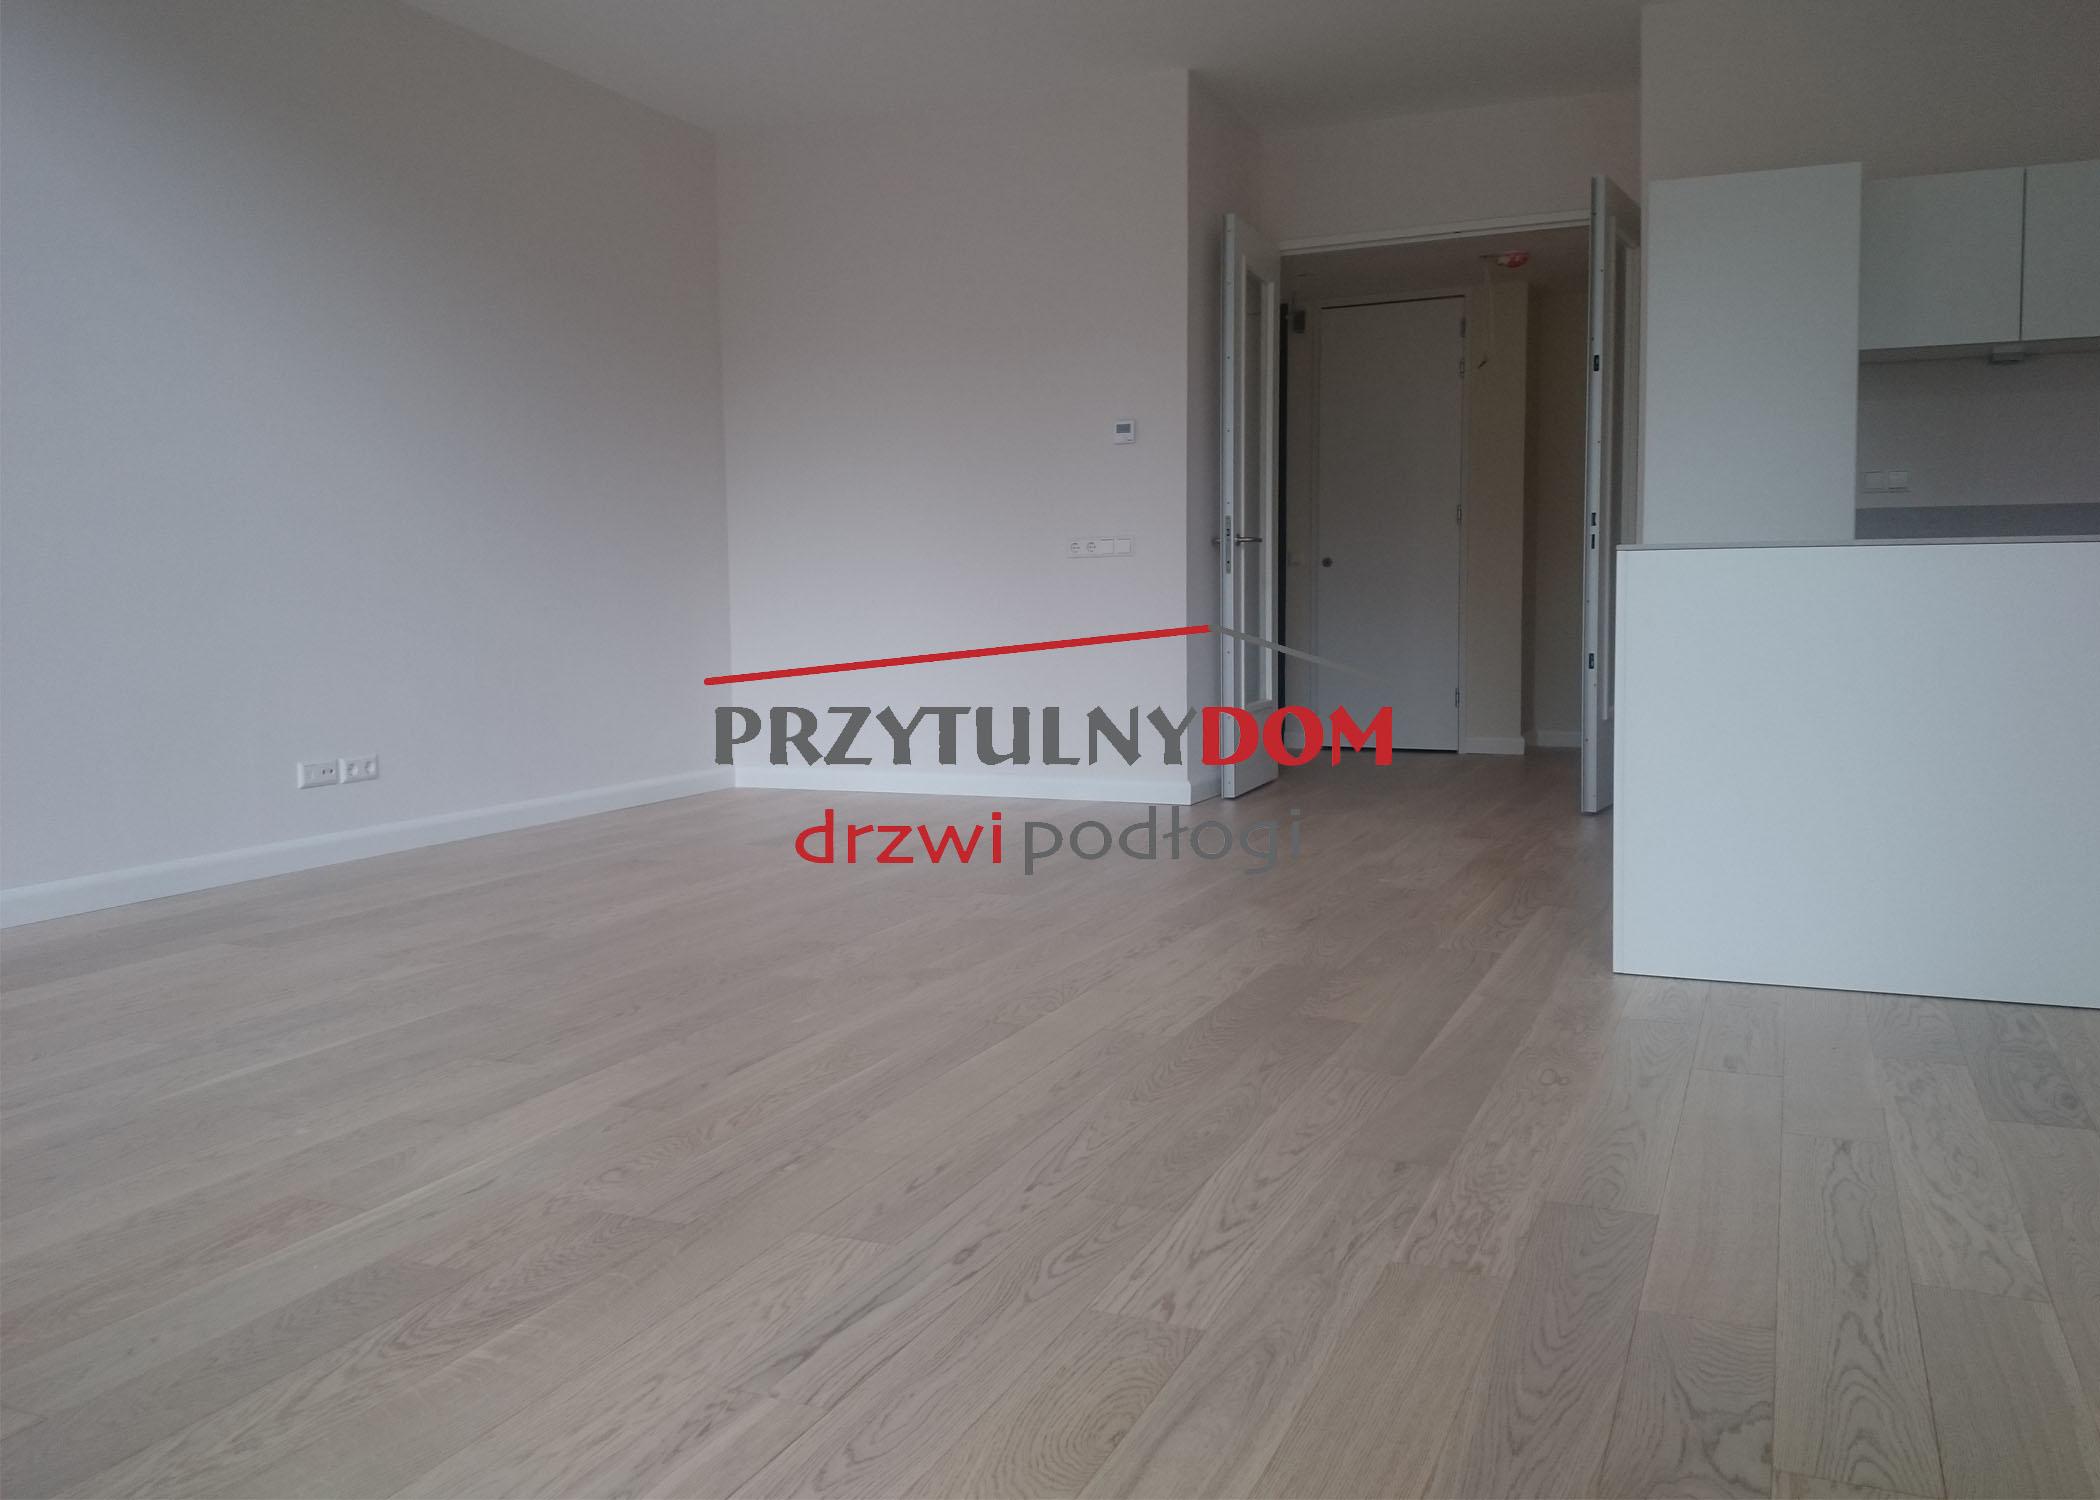 baltic wood HAPPINES DĄB COTTAGE 1R CREAM&CREAM LAKIER MAT SZCZOTKOWANY